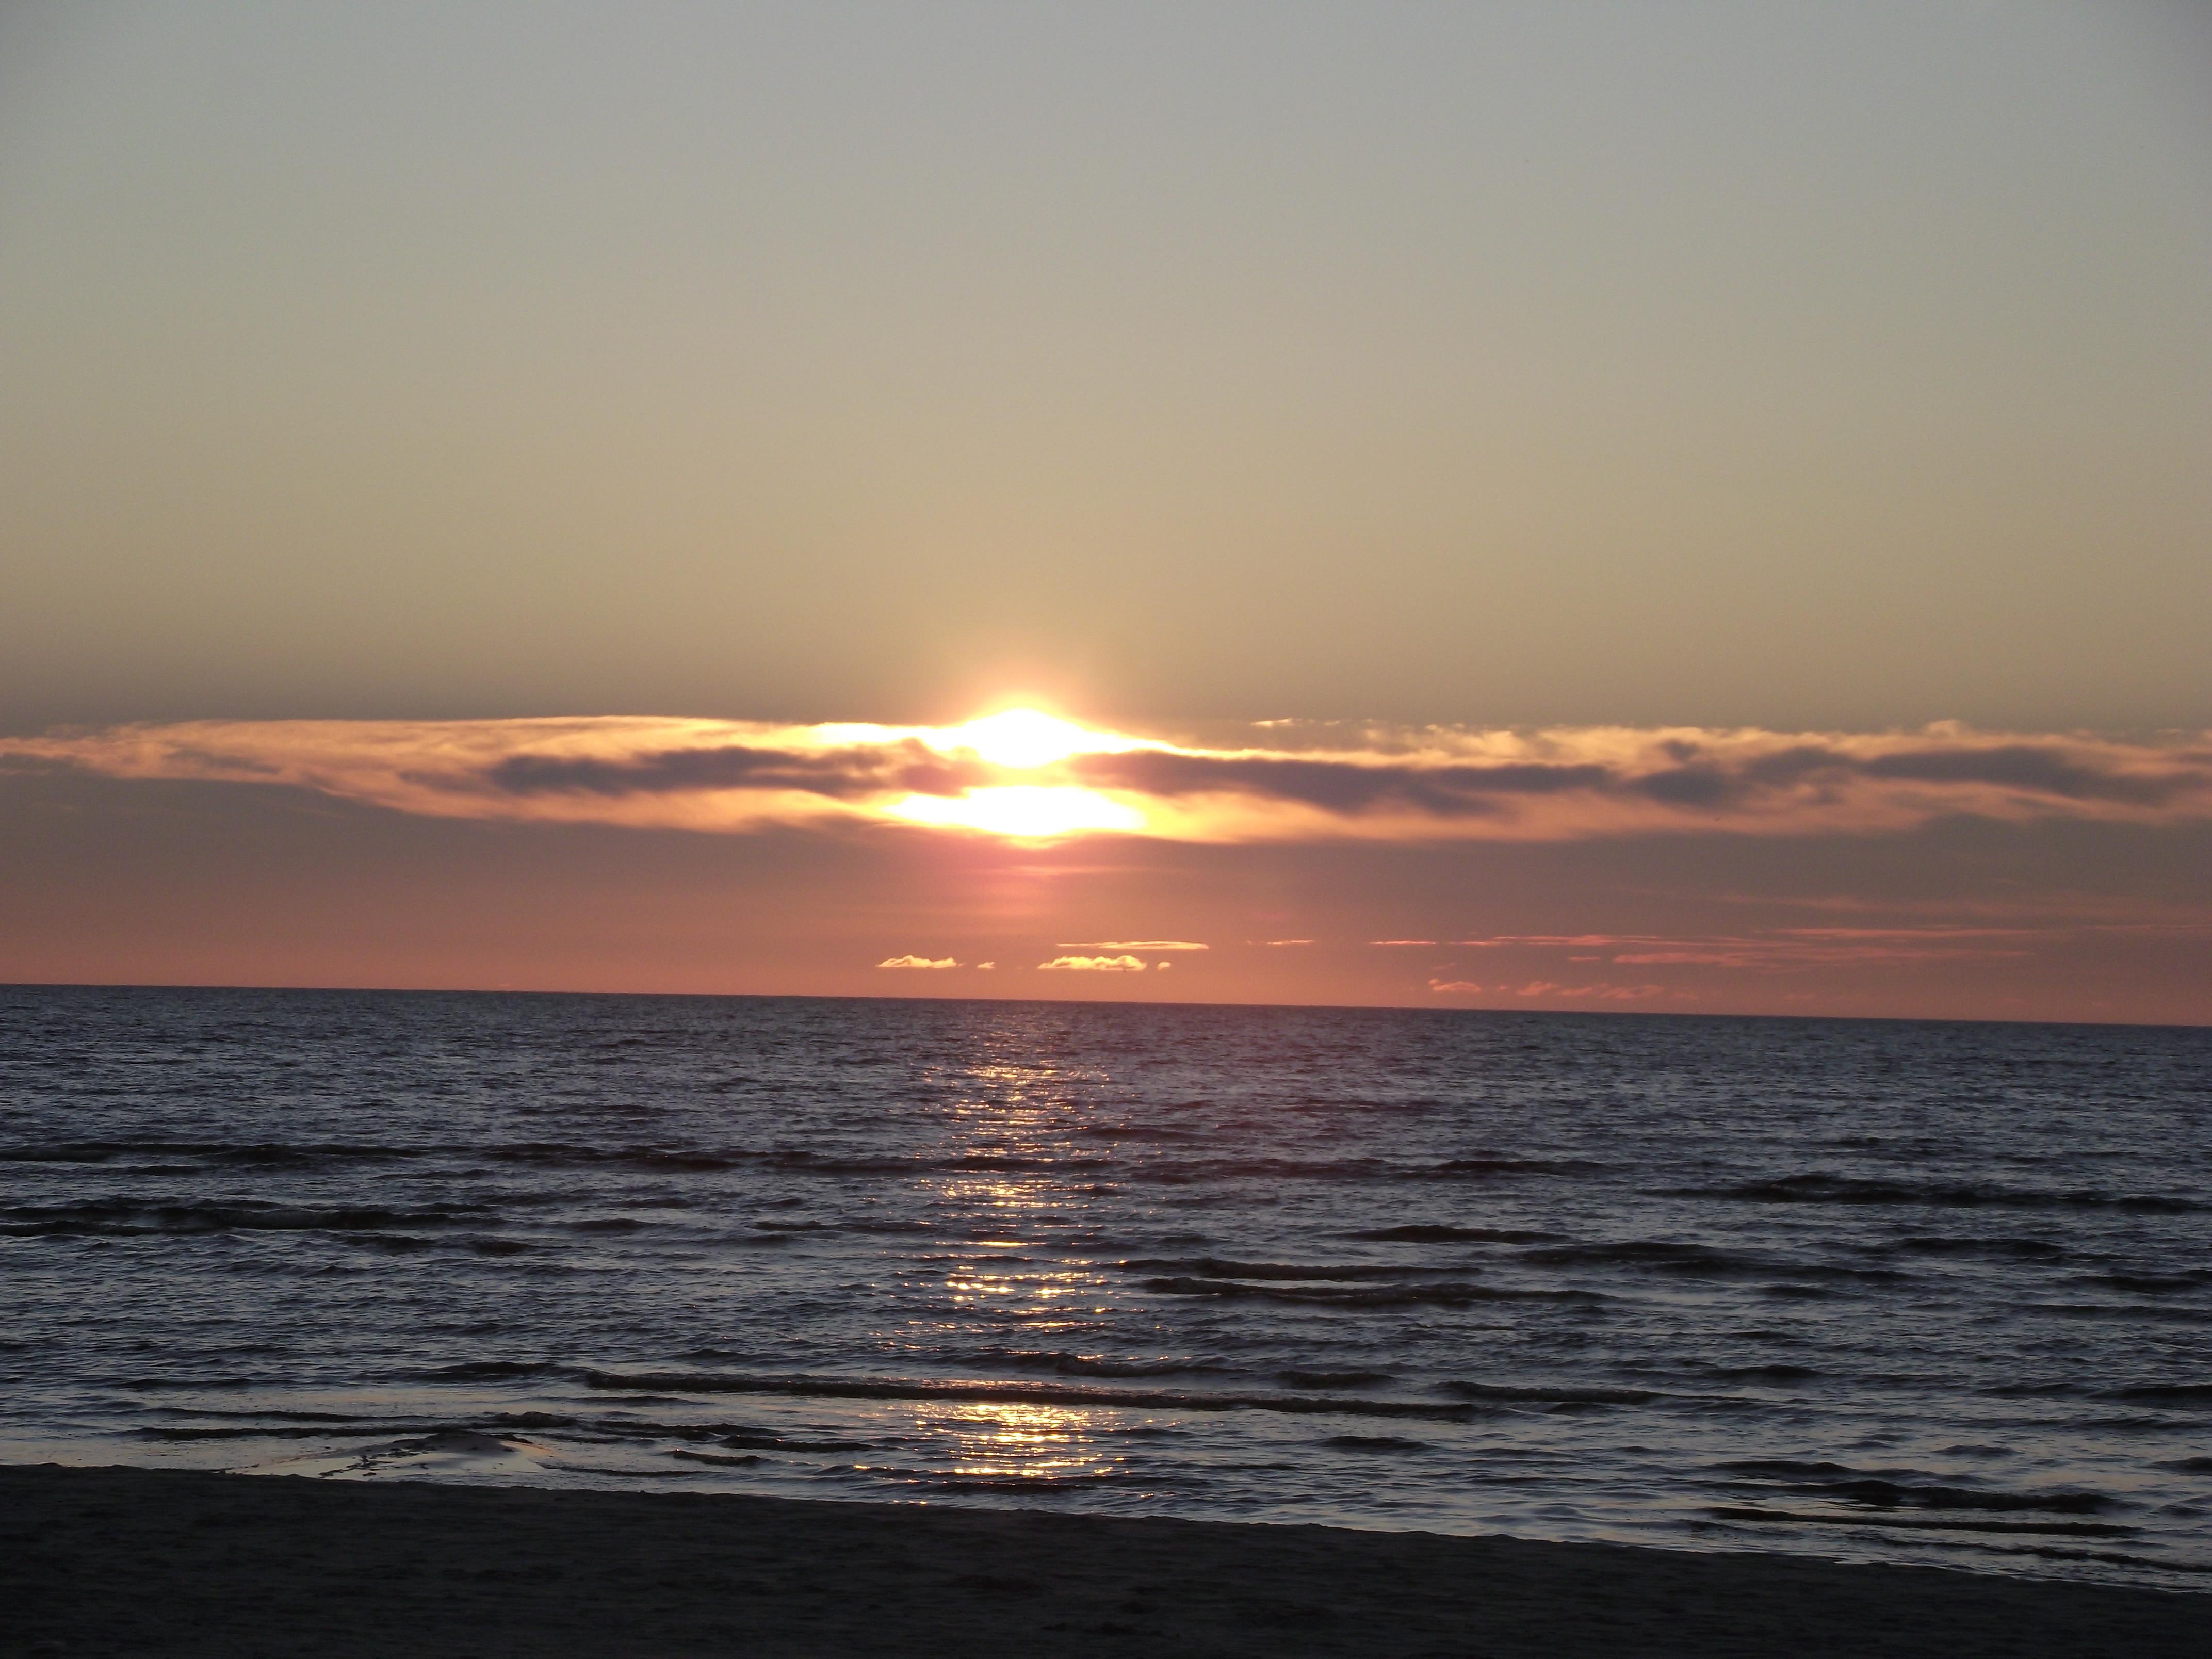 Sunset - Baltic Sea, 2012, Beautiful, Dawn, Hd, HQ Photo